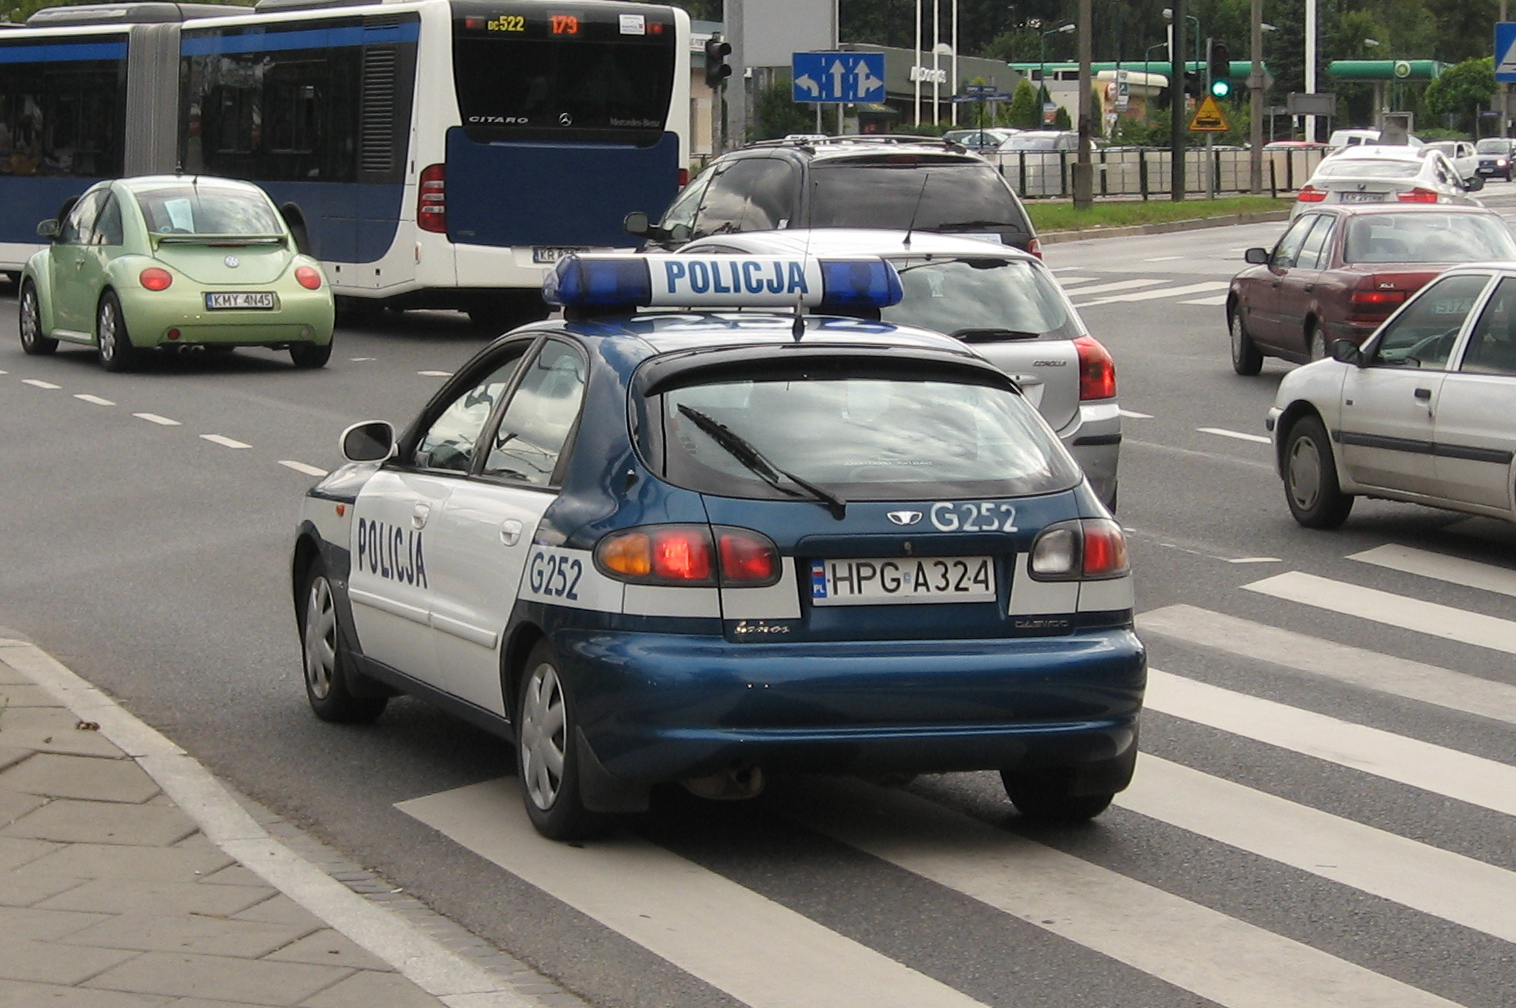 hight resolution of file daewoo lanos police squad car of policja on marii konopnickiej avenue in krak w 1 jpg